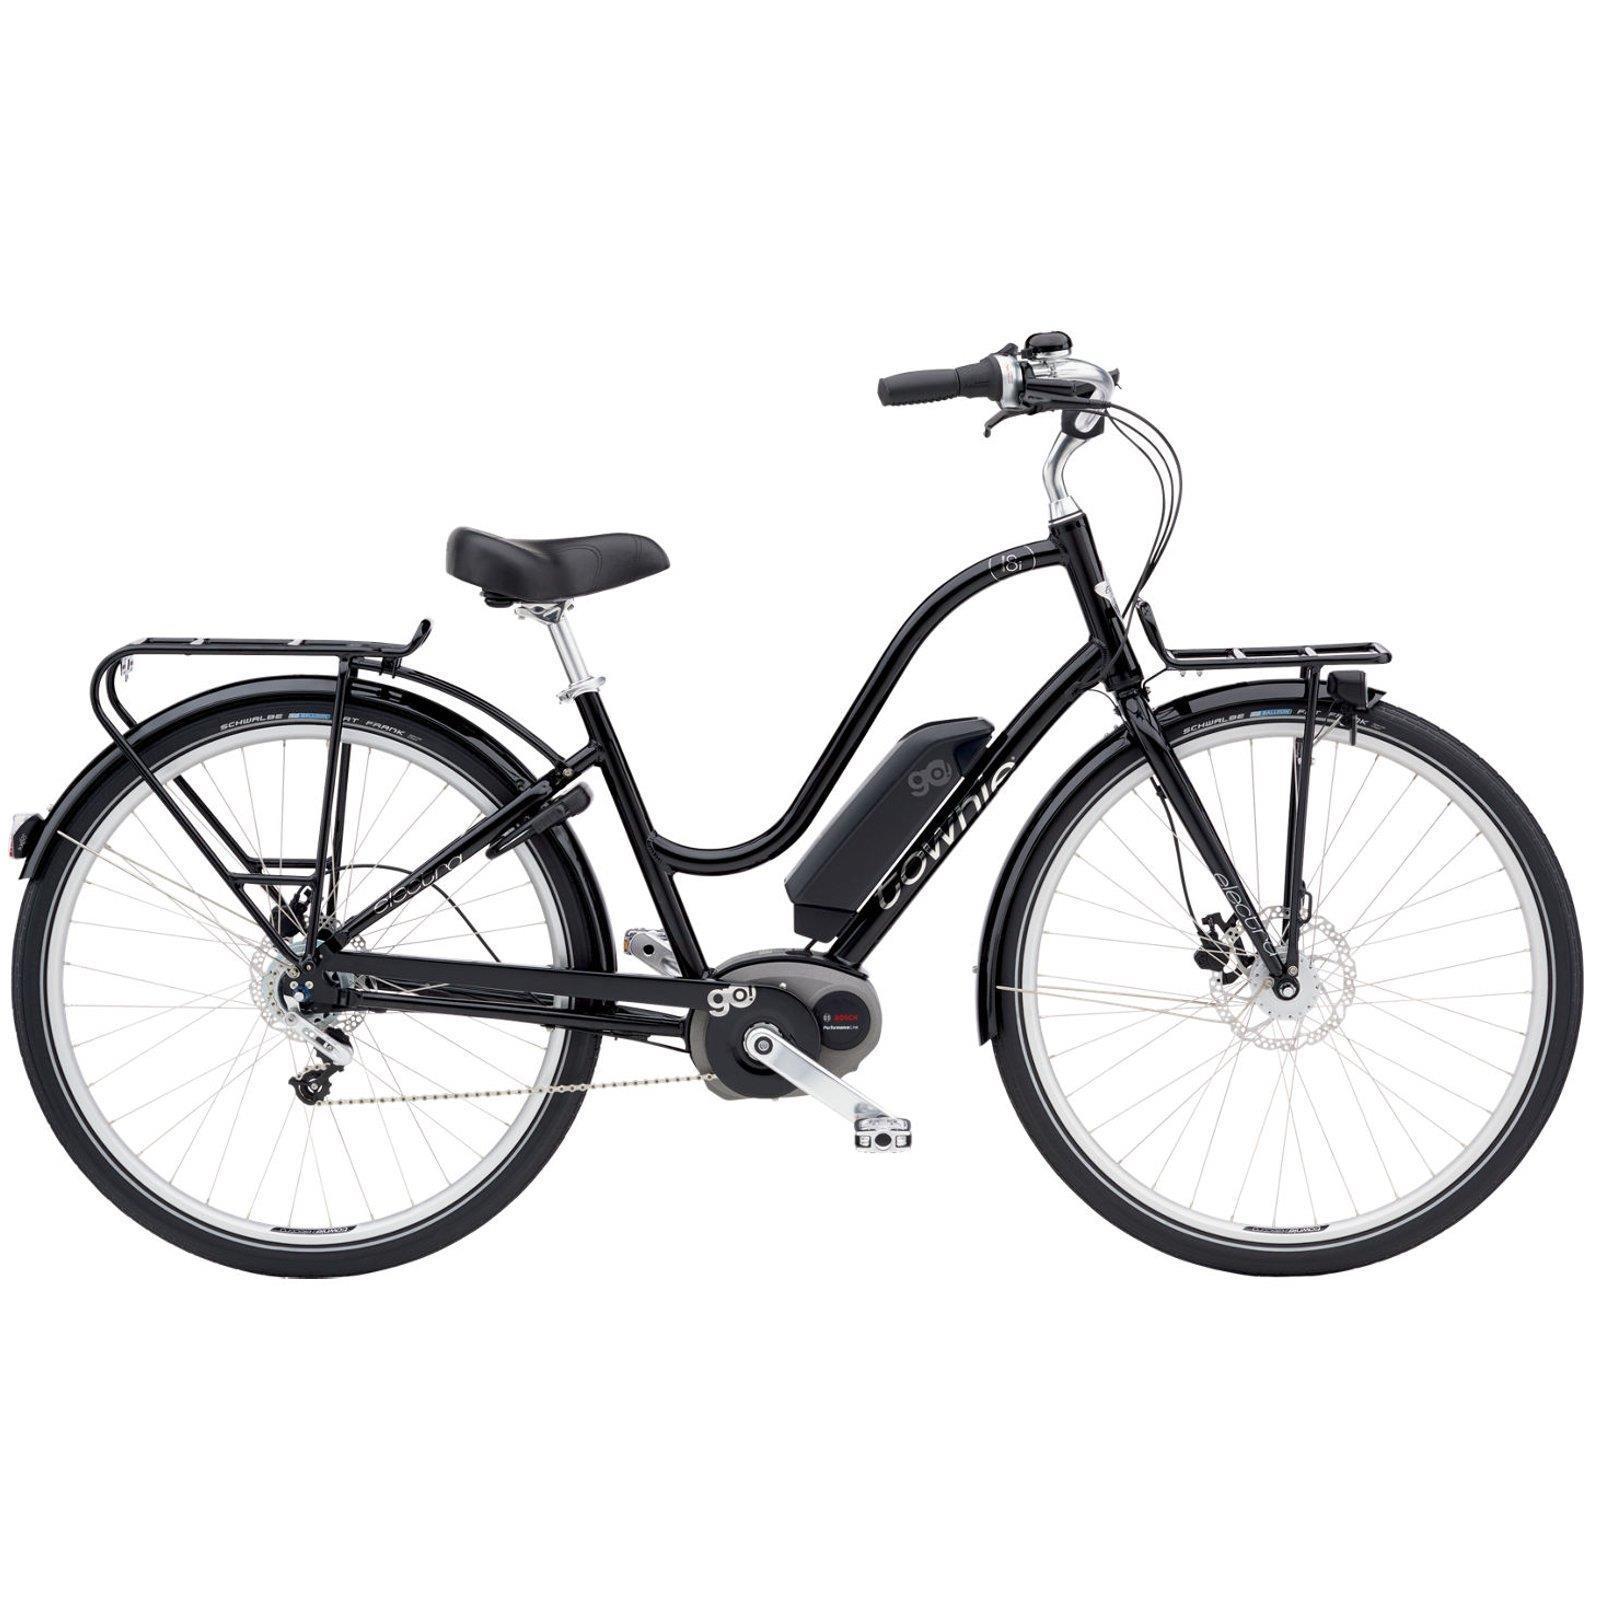 electra townie commute go damen e bike fahrrad 28 zoll beach cruiser retro rad ebay. Black Bedroom Furniture Sets. Home Design Ideas